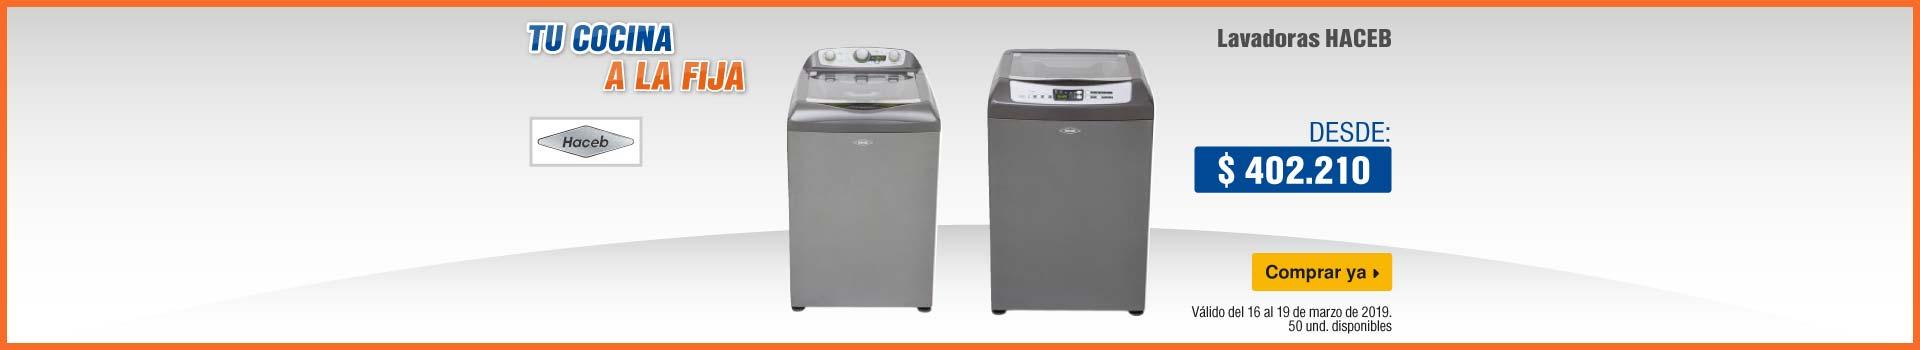 AK-KT-mayores-2-ELECT-BCAT-lavadoras-haceb-160319-2